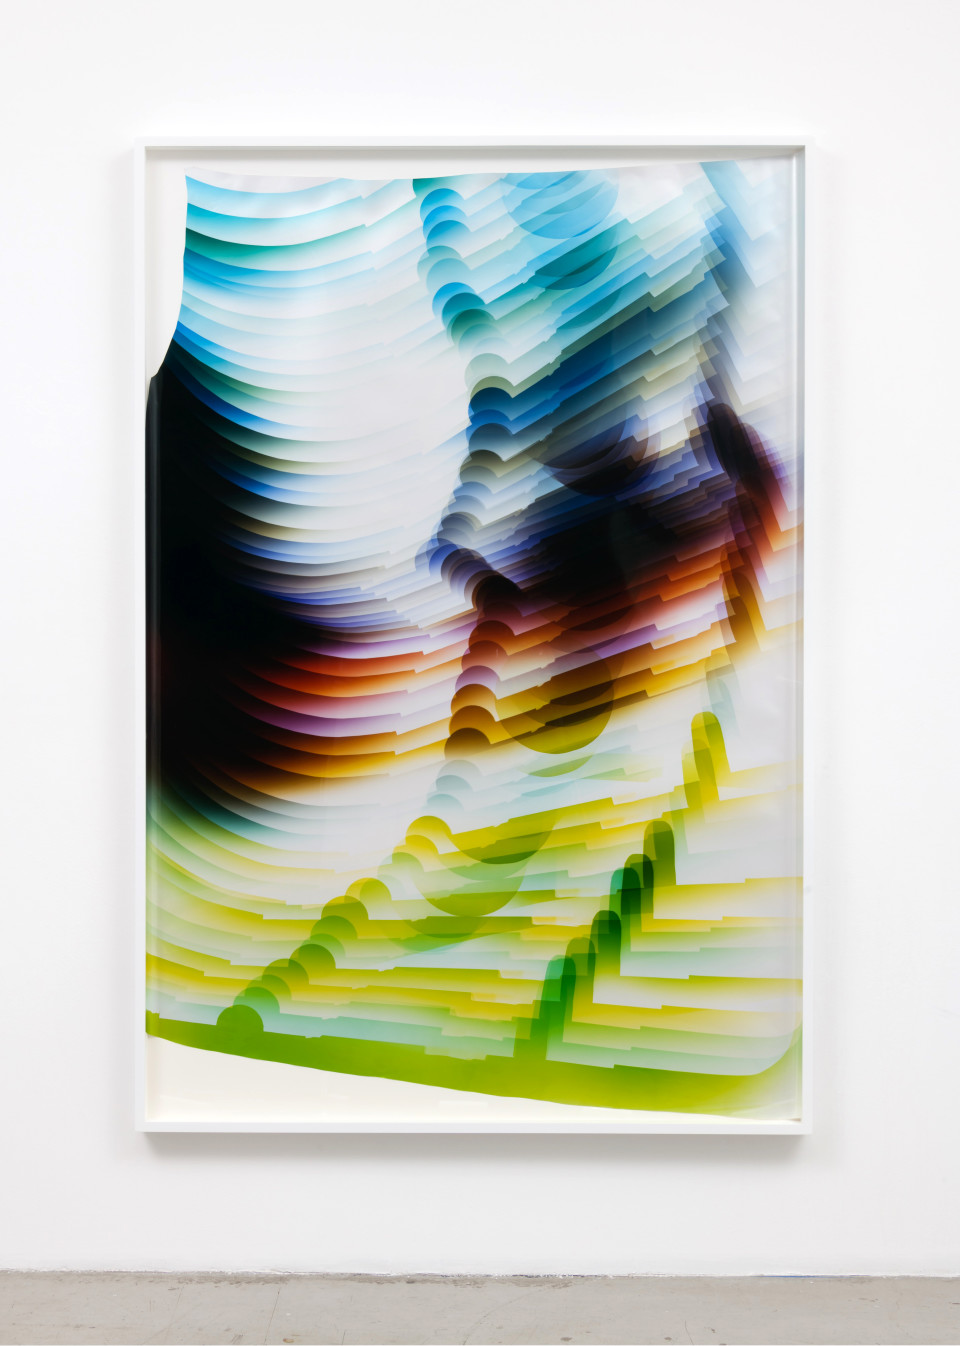 Image: Mariah Robertson  227, 2017  unique chromogenic print  72 x 49 inches (182.9 x 124.5 cm)